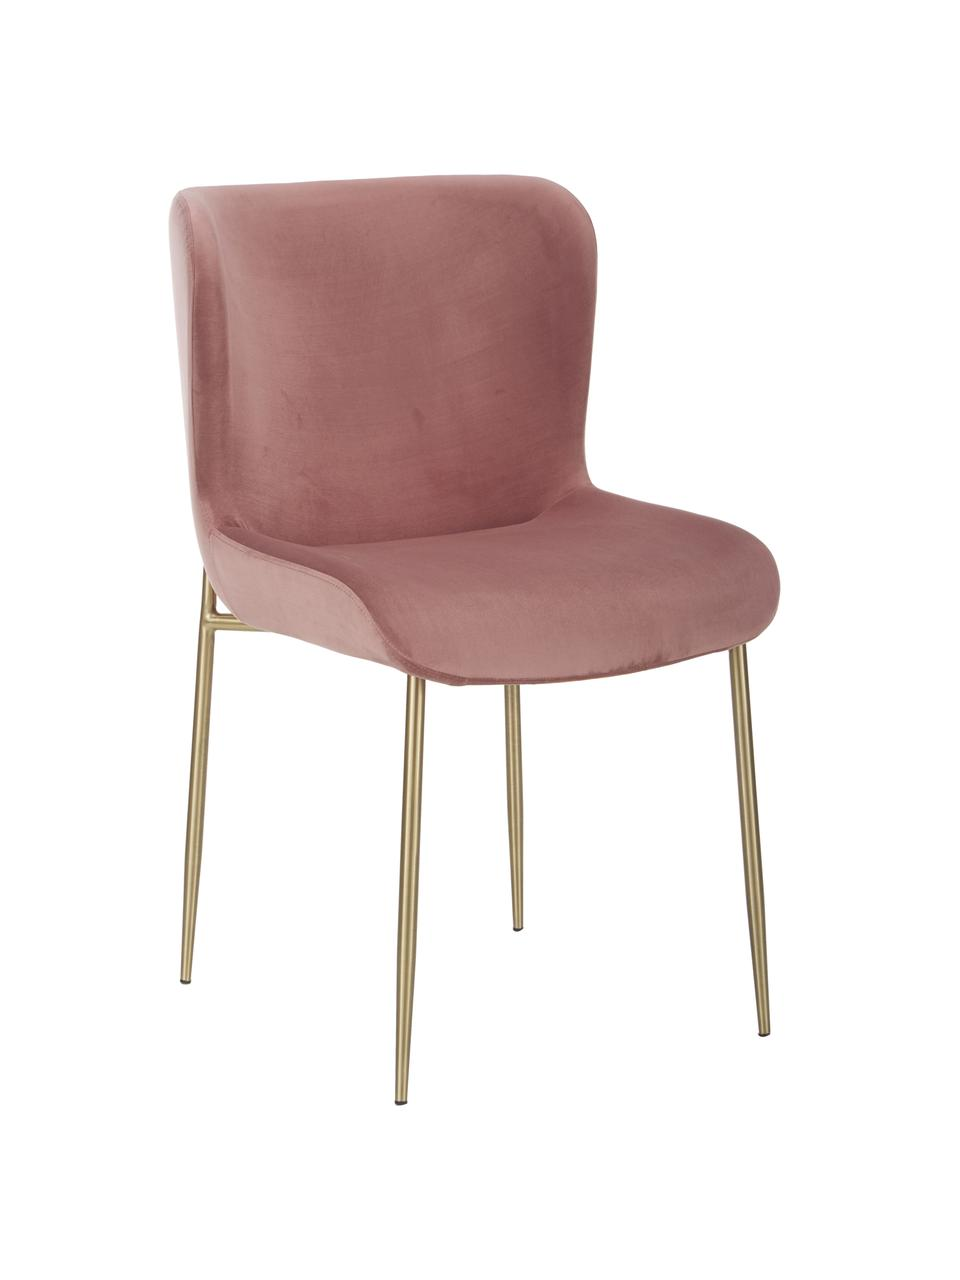 Chaise velours rembourrée Tess, Velours vieux rose, pieds or